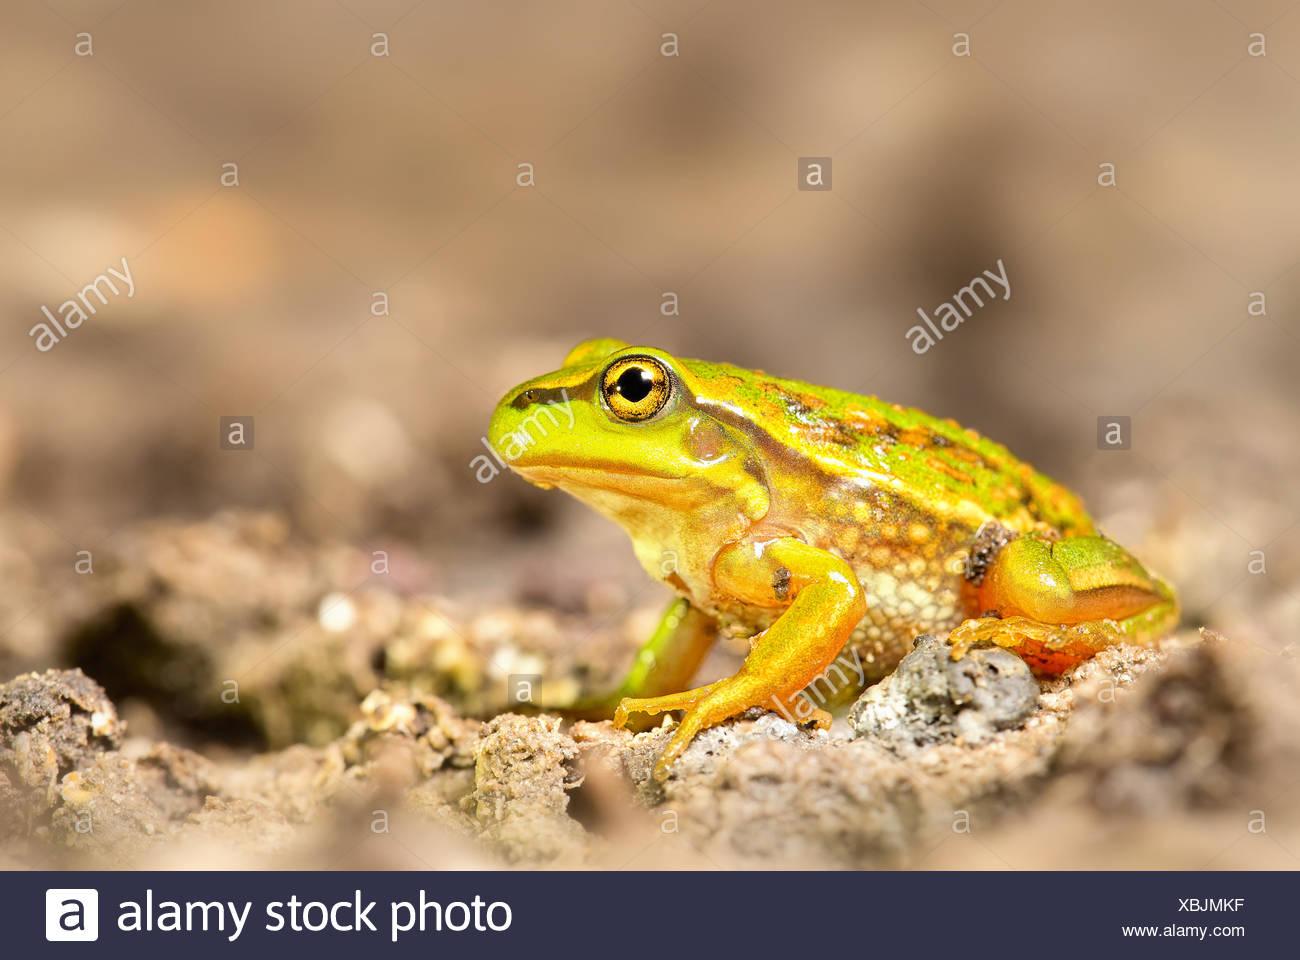 Australia, Victoria, Growling grass frog sitting on dirt - Stock Image